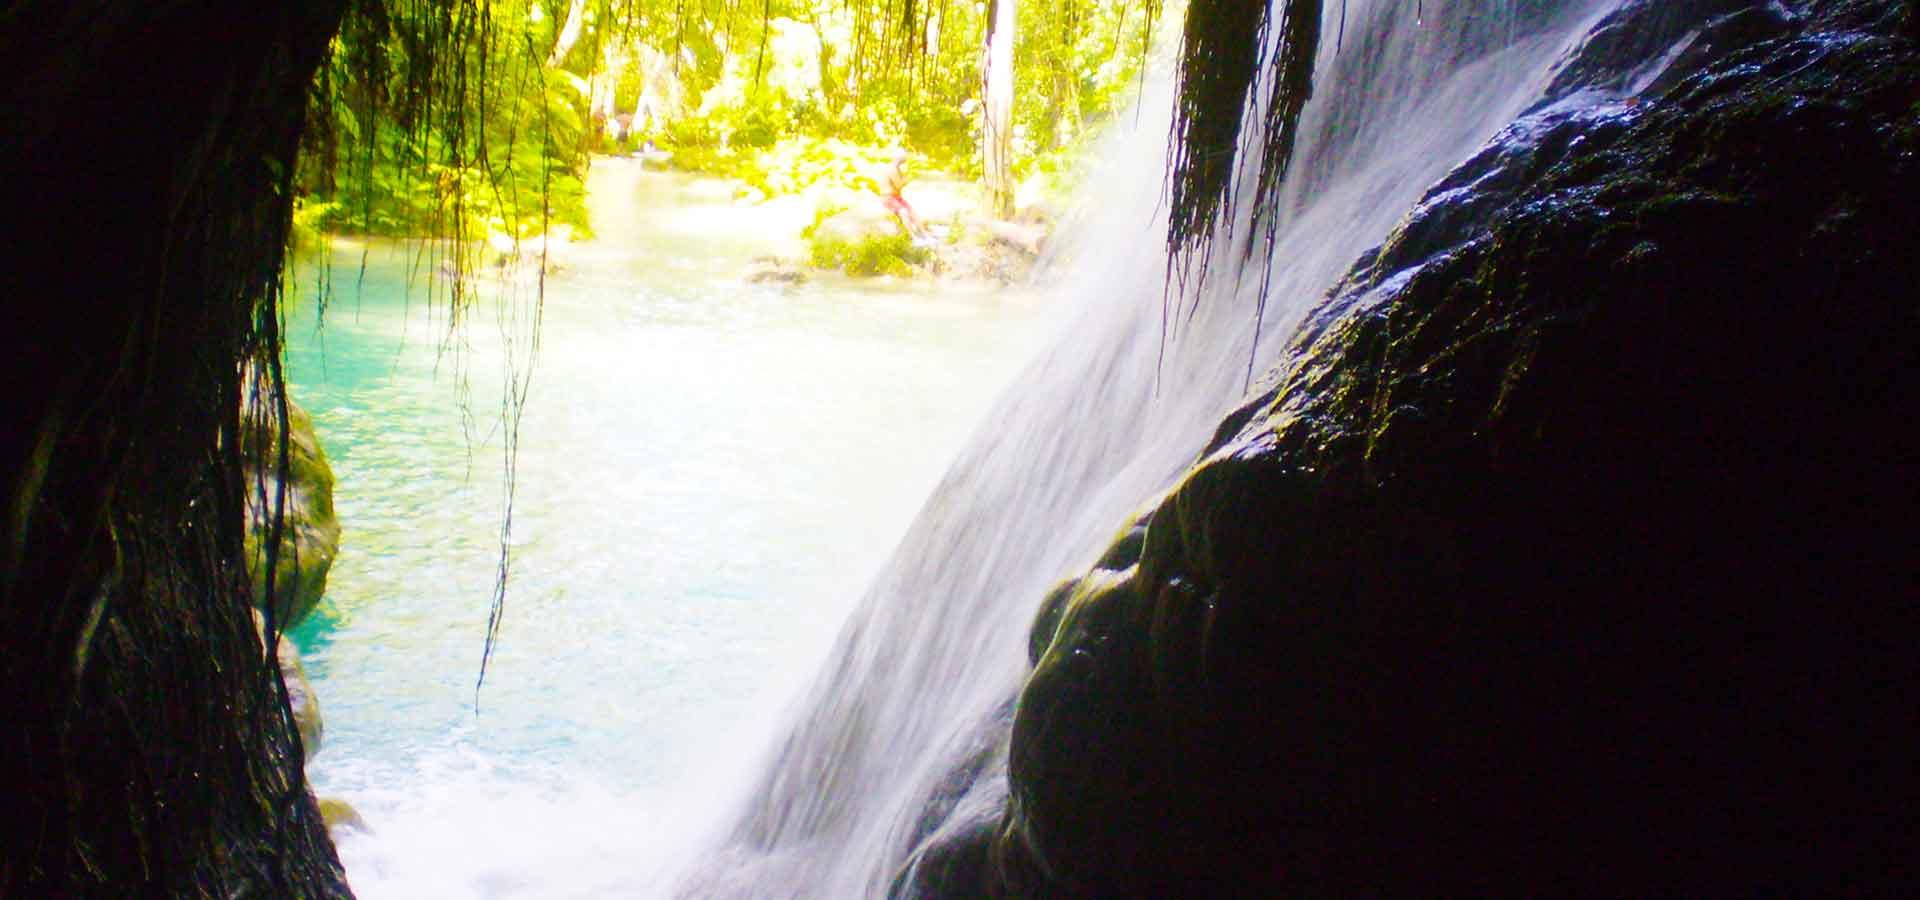 Inside the cave at the blue holes and secret falls, Ocho Rios